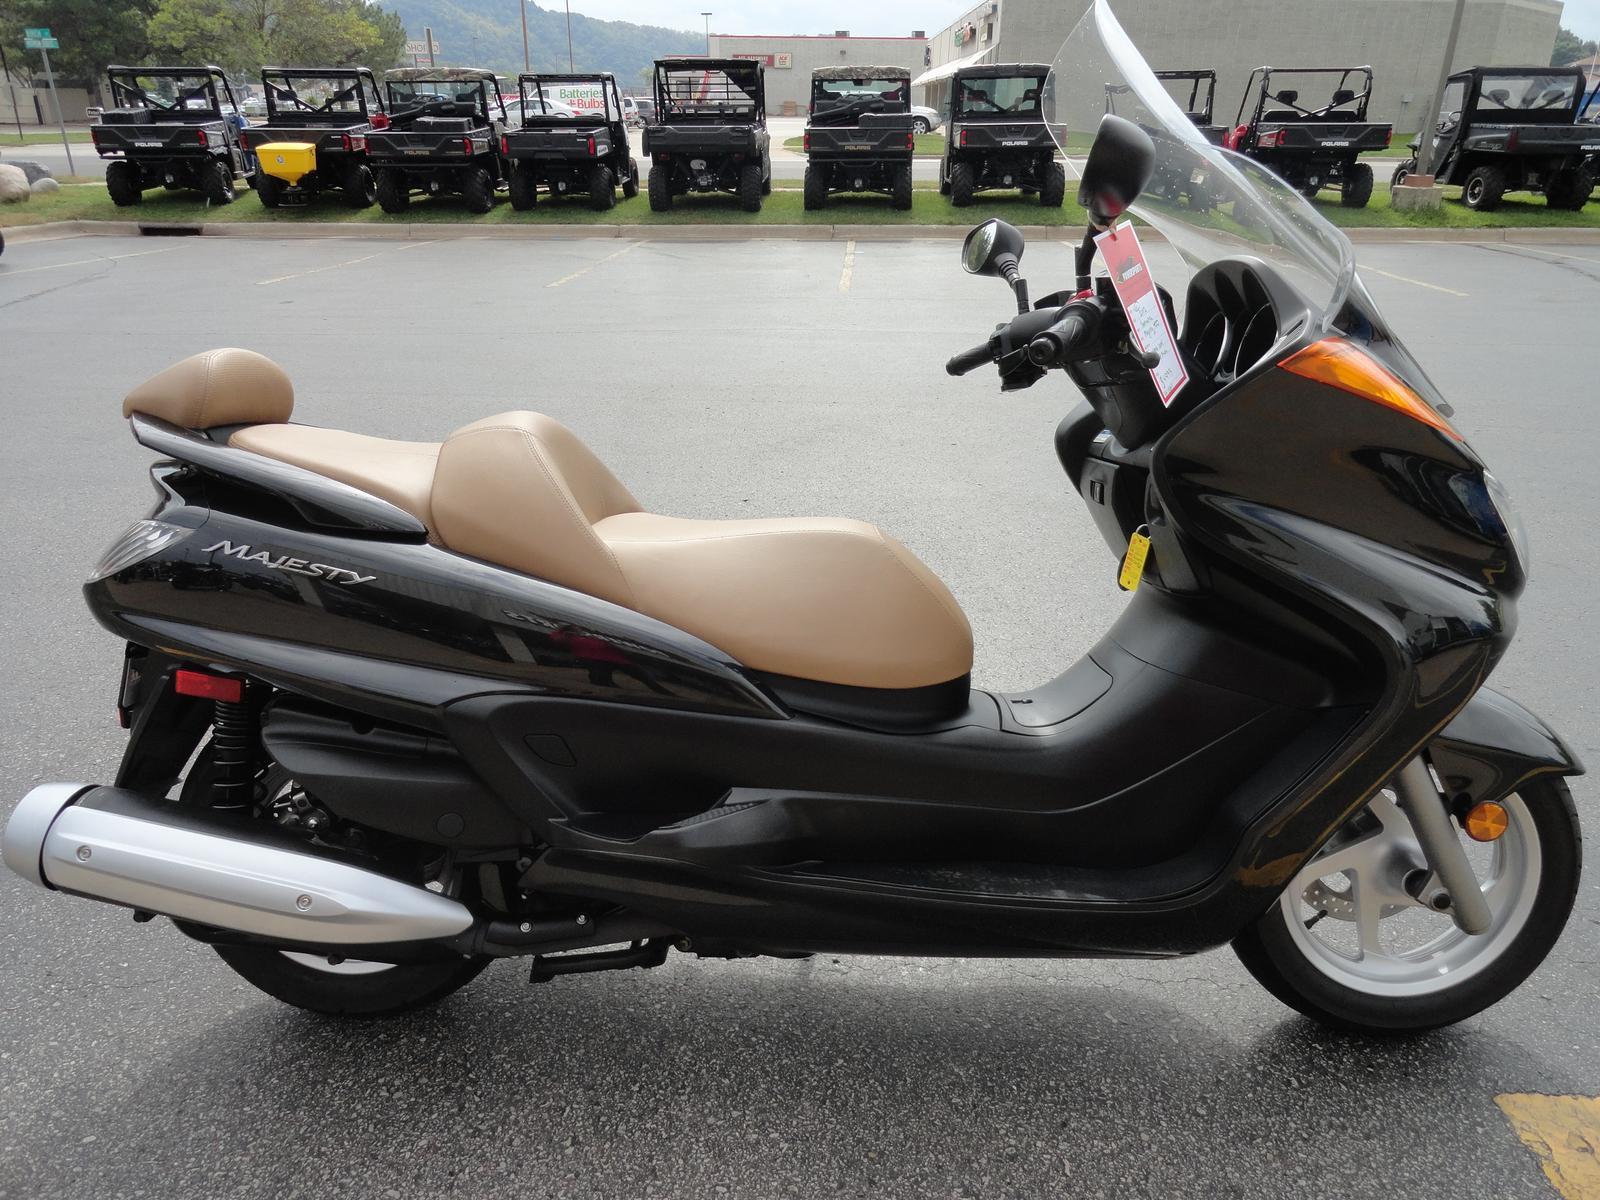 Inventory Rod's Ride On Powersports La Crosse, WI (608) 788-4514